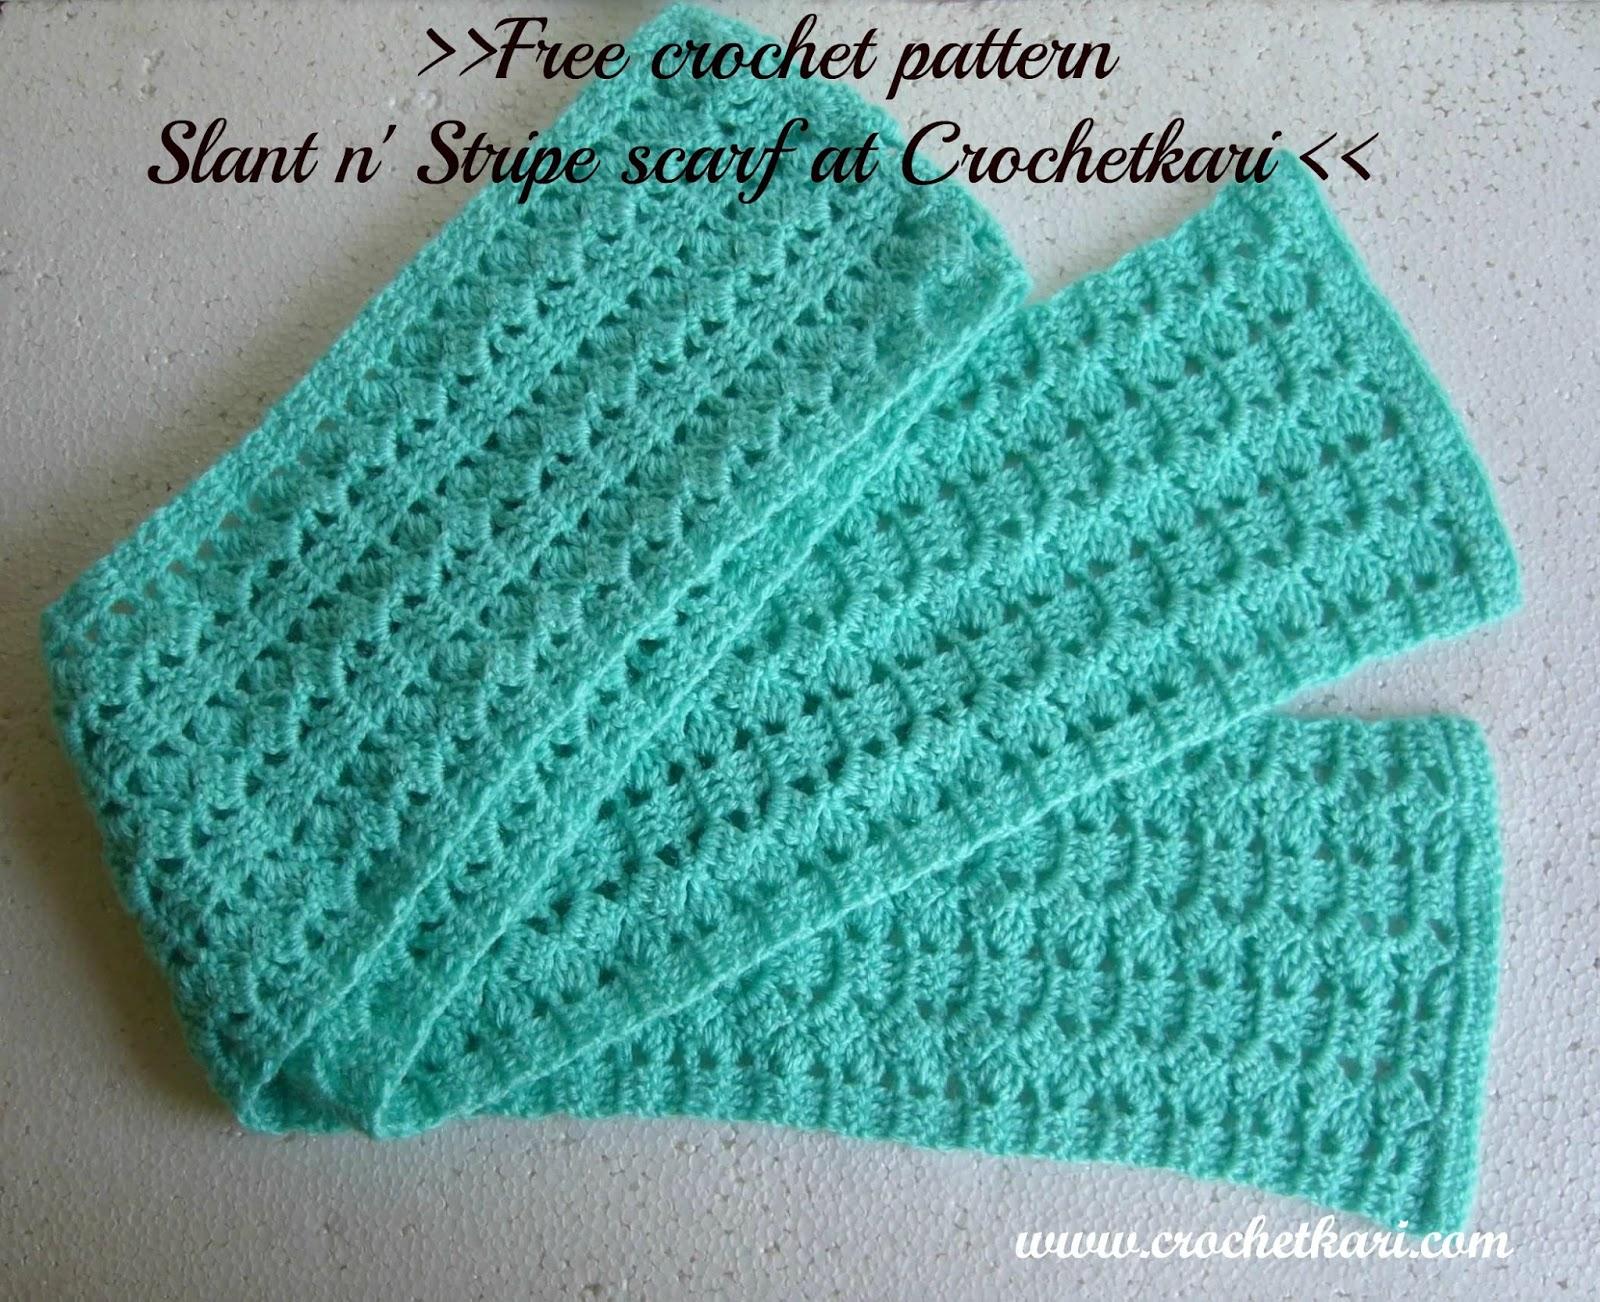 Crochetkari: Free Crochet Pattern - Slant n Stripe Scarf